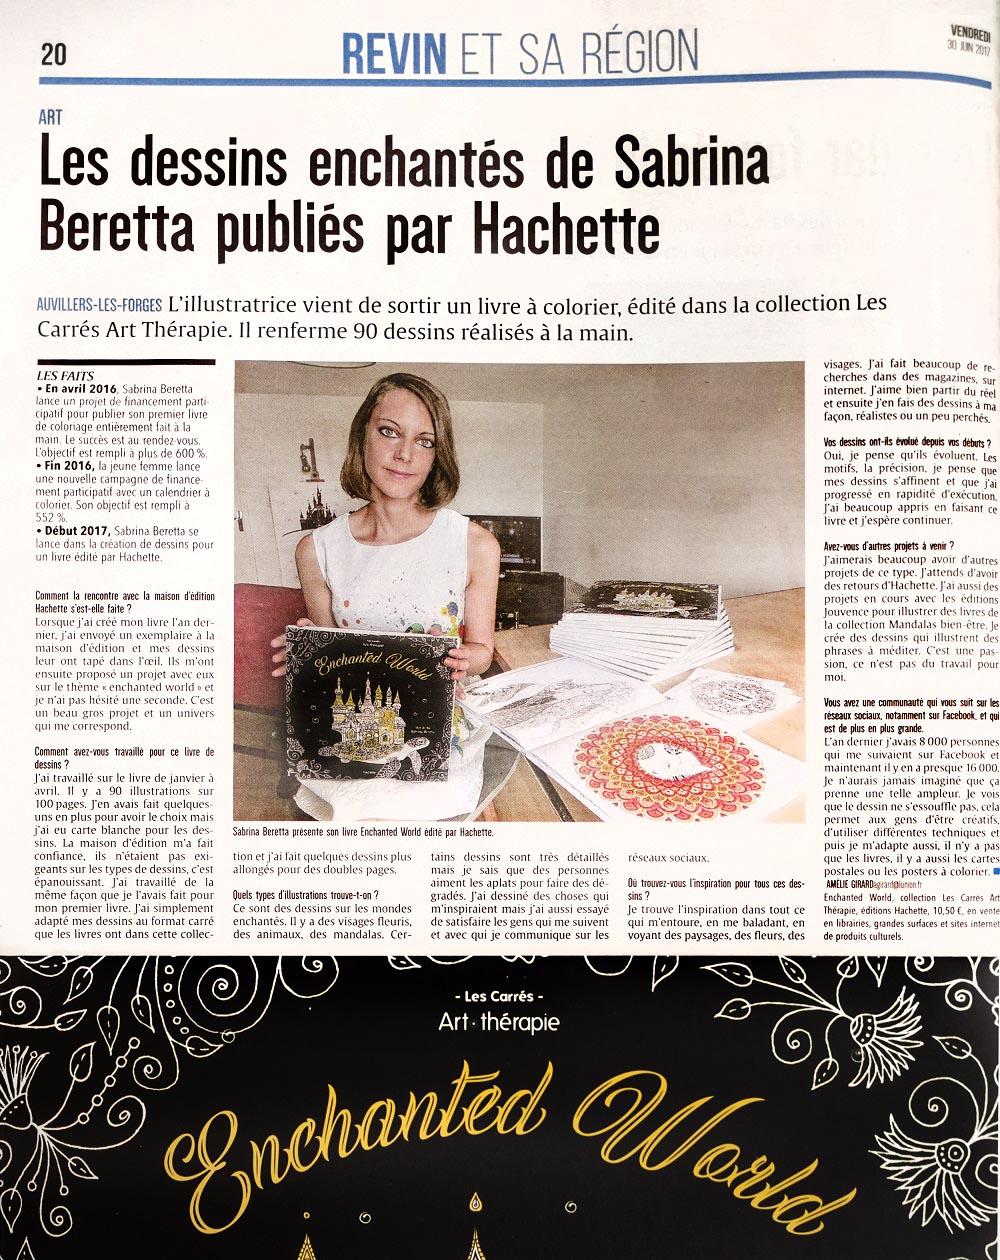 enchanted world par sabrina beretta